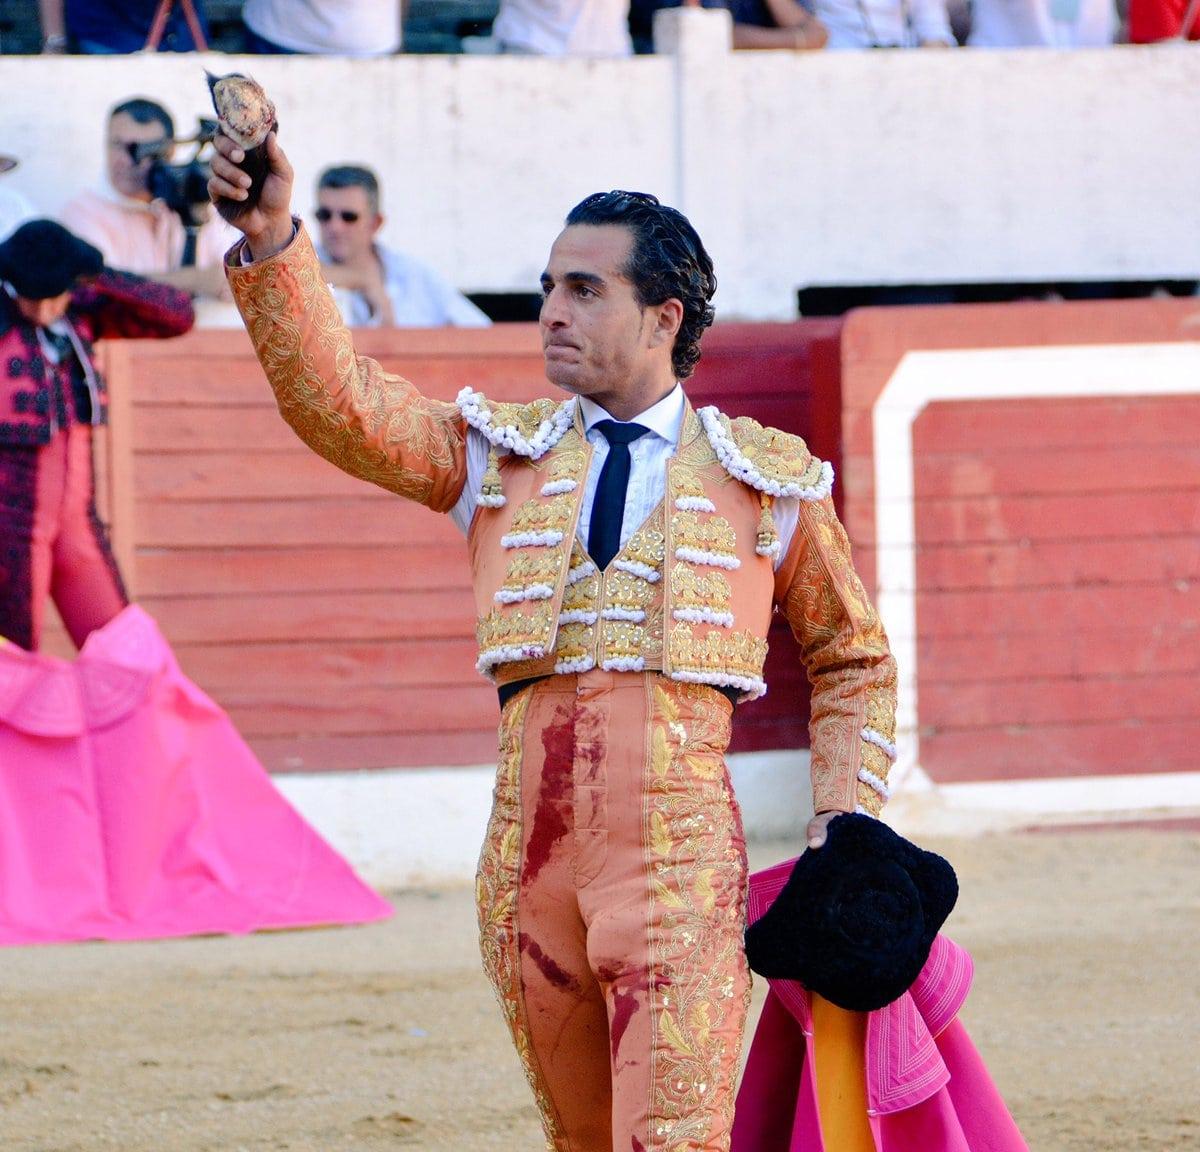 Muere el torero Iván Fandiño